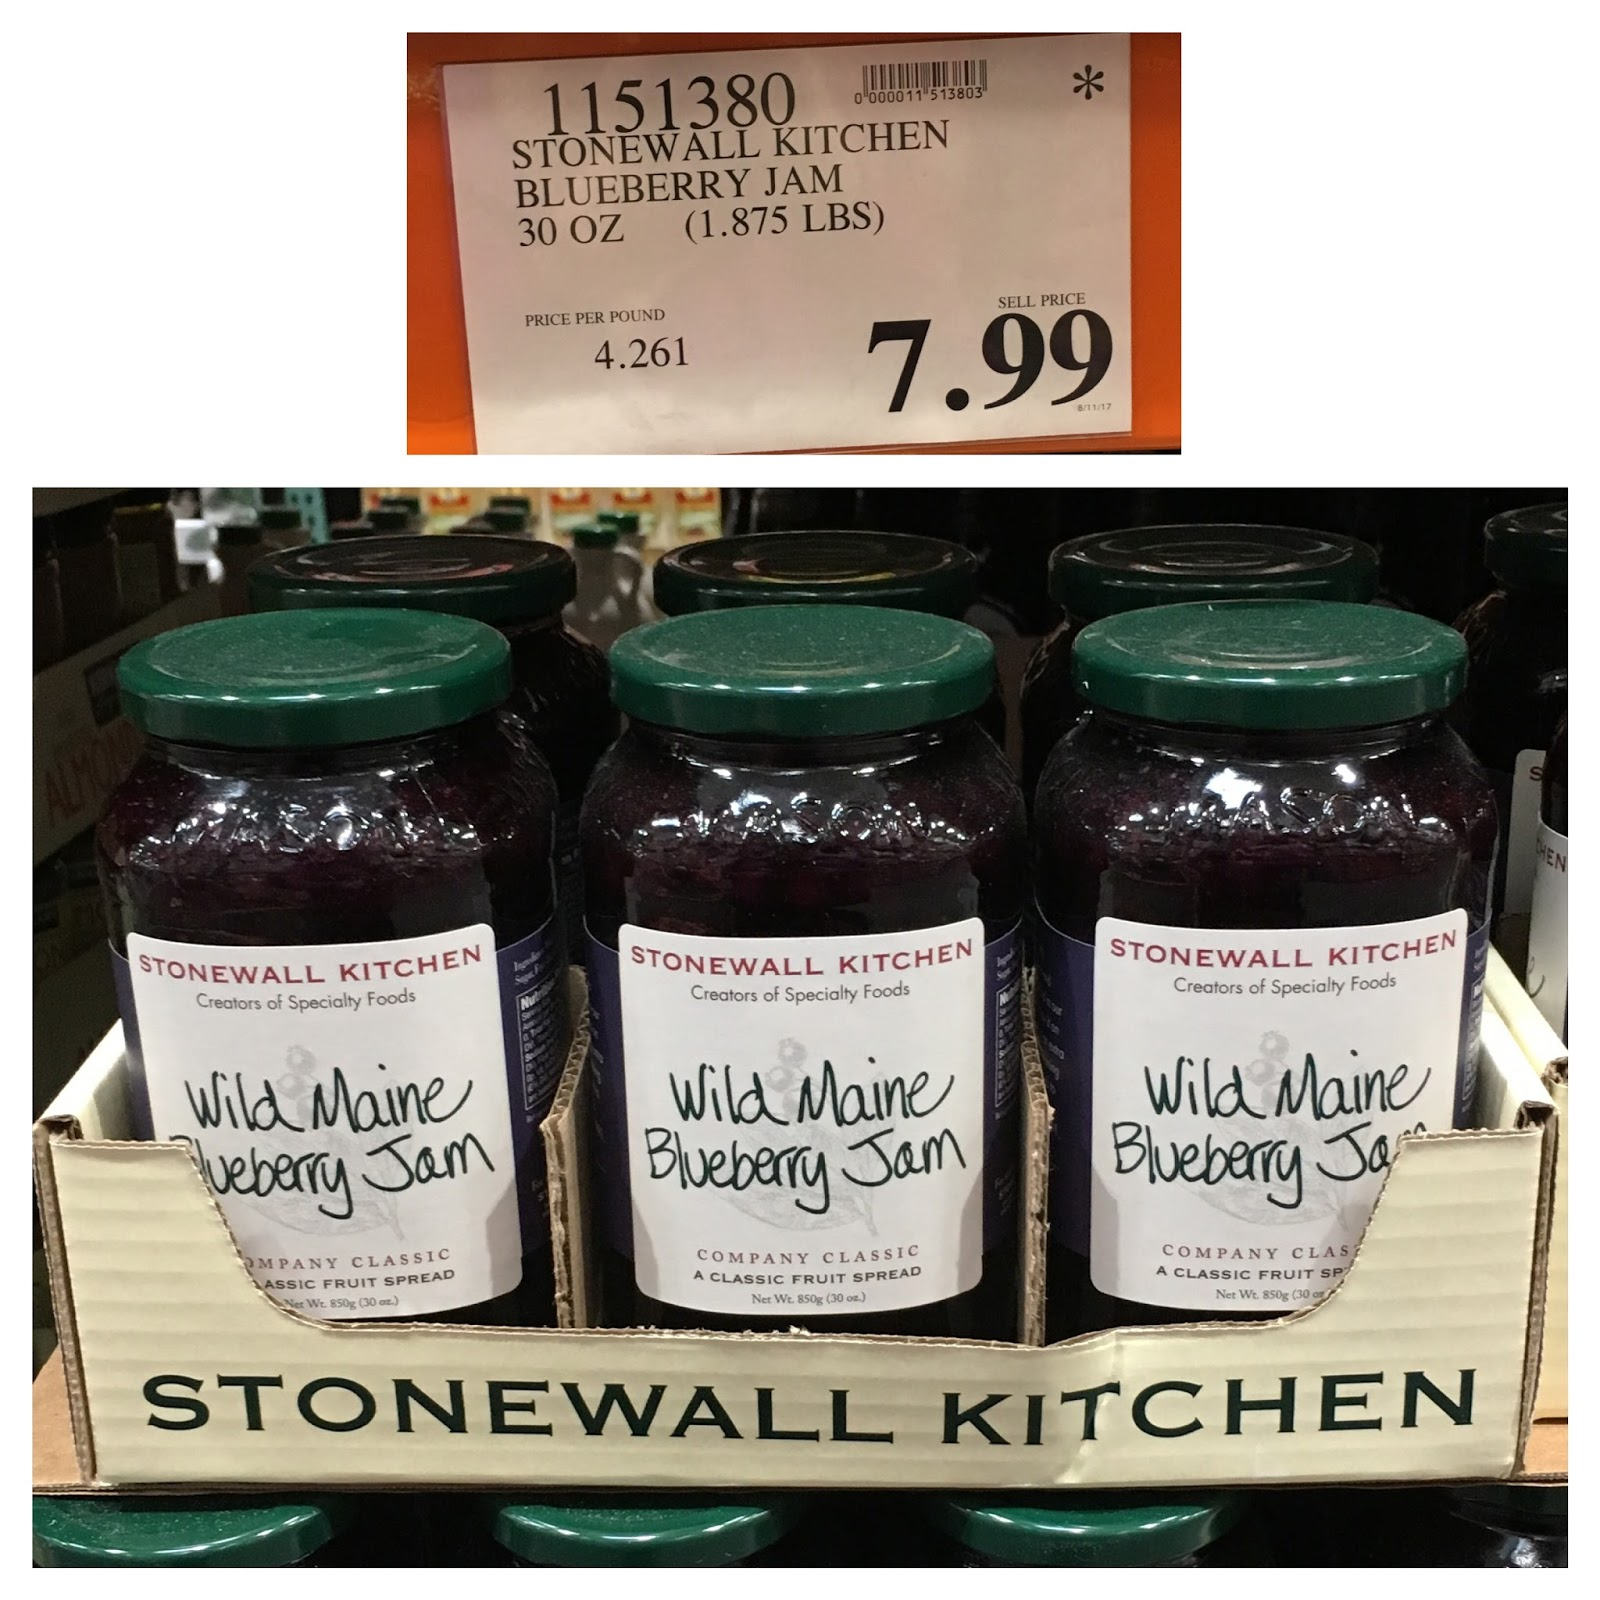 Stonewall Kitchen Jam Travel Trailers With Rear Wild Maine Blueberry Costco Dandk